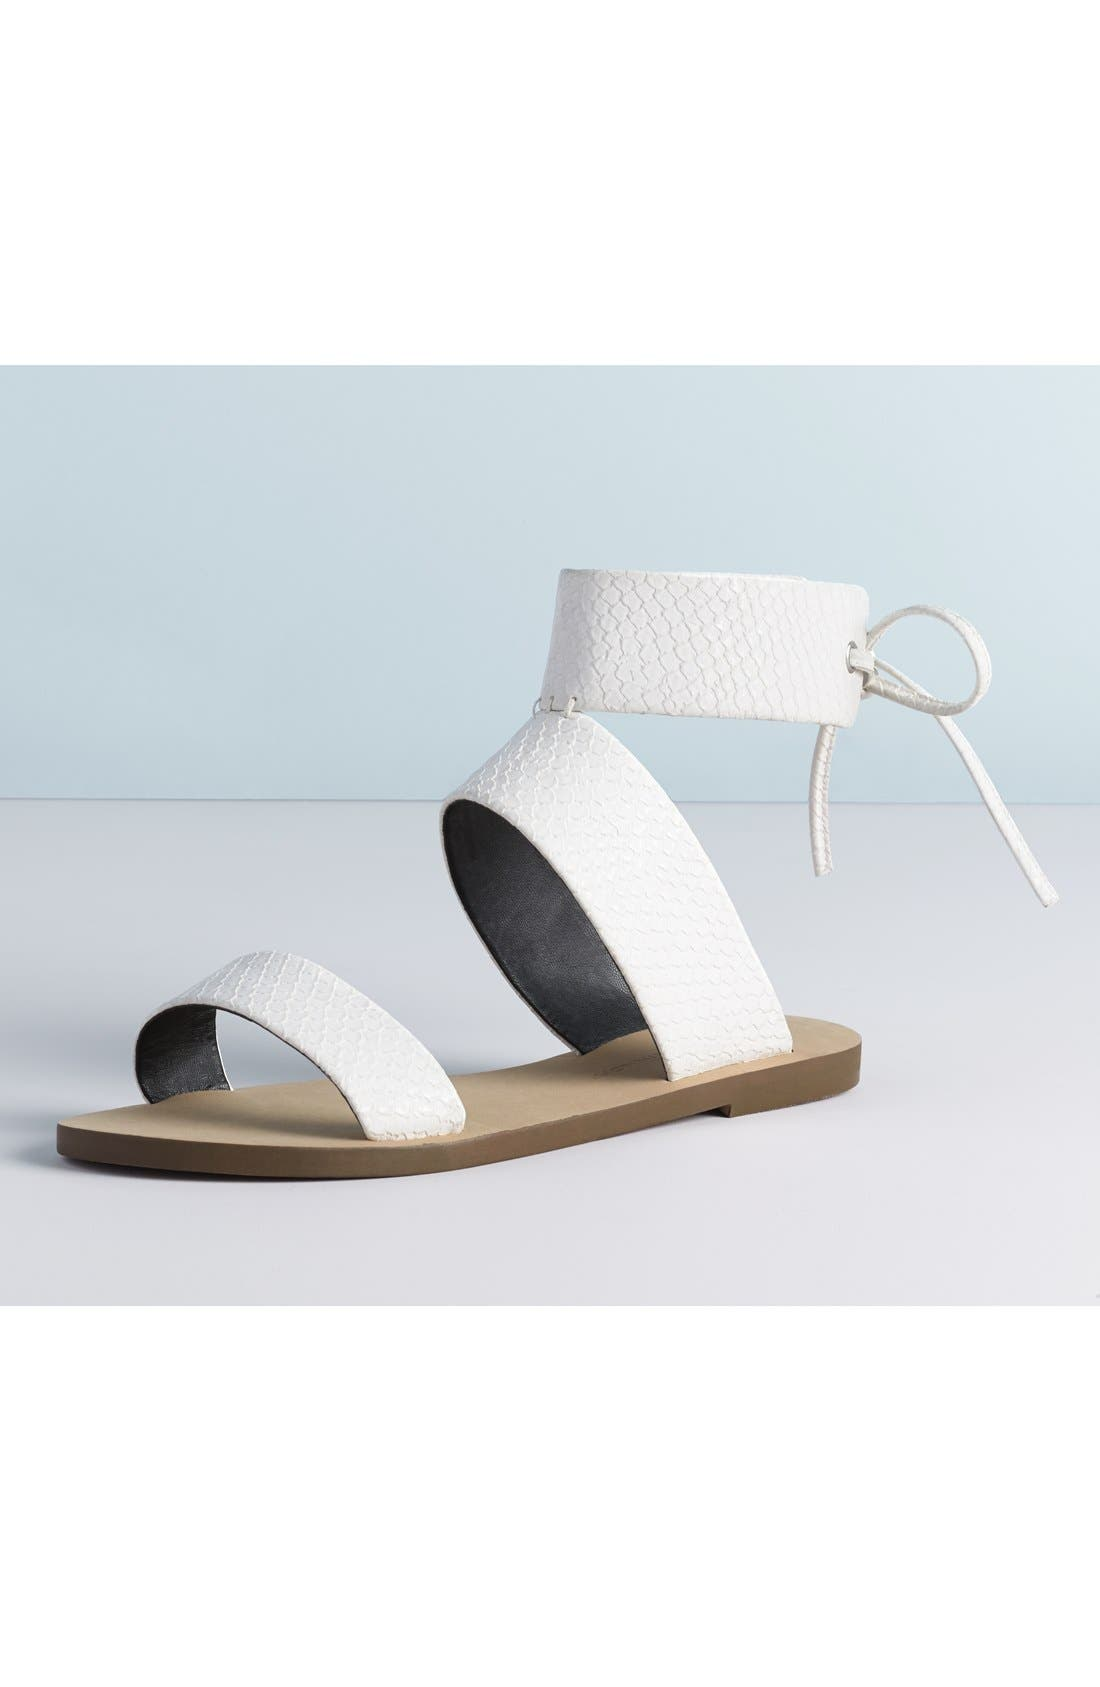 'Emma' Ankle Cuff Sandal,                             Alternate thumbnail 6, color,                             001